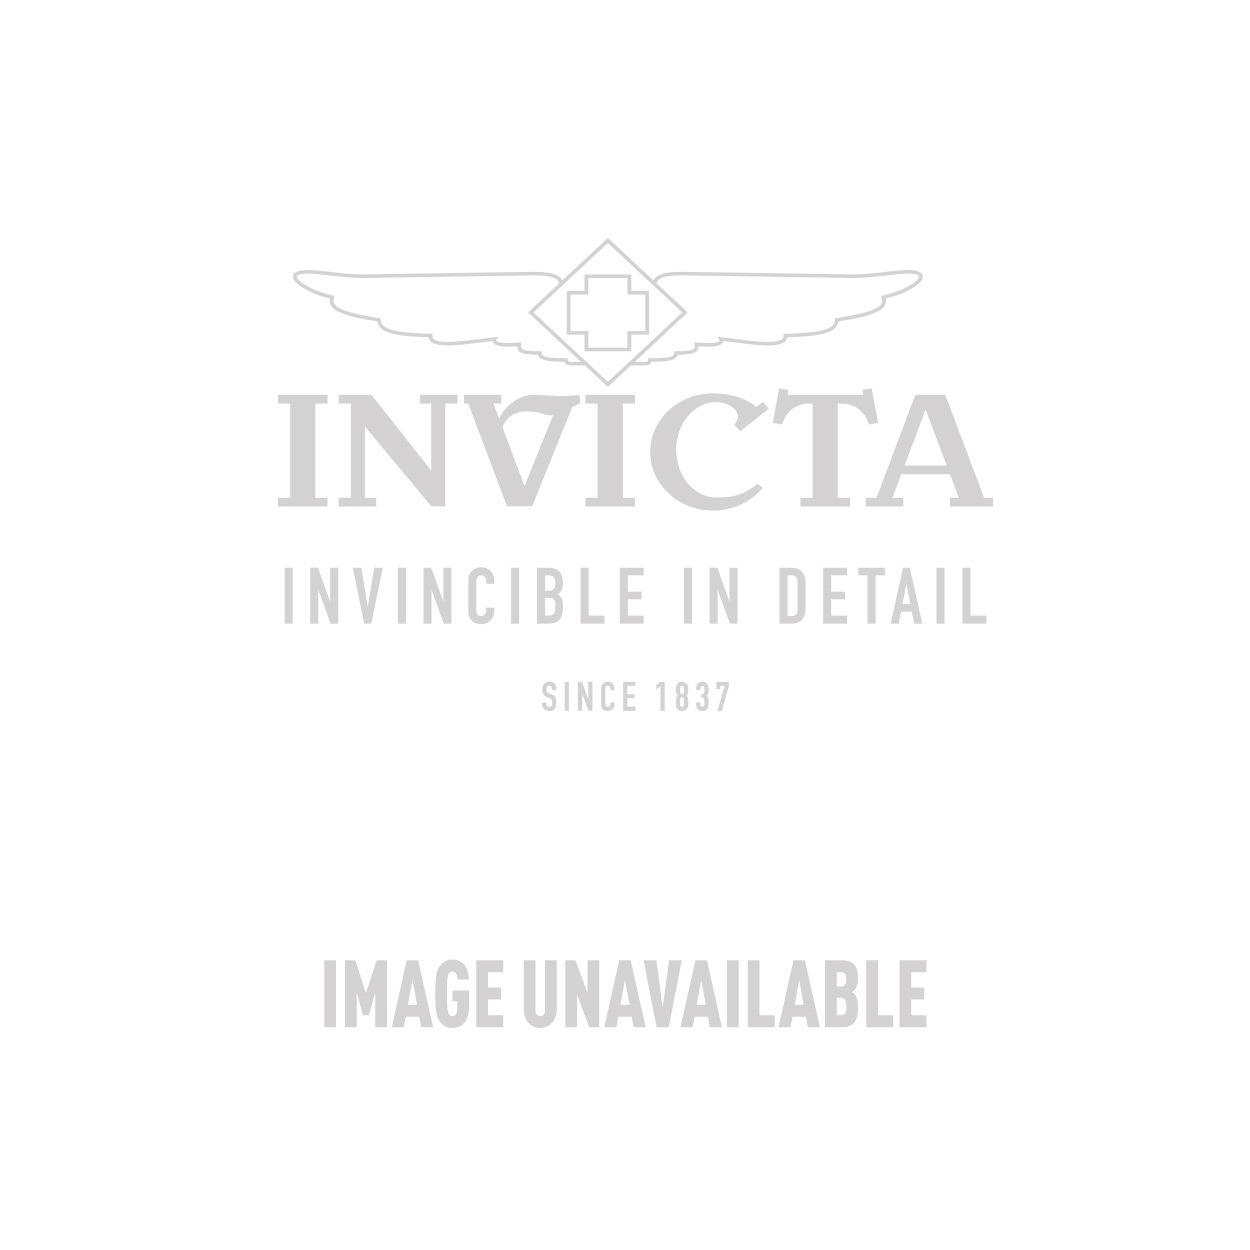 Invicta Corduba Swiss Made Quartz Watch - Black, Gunmetal case with Black tone Polyurethane band - Model 90229